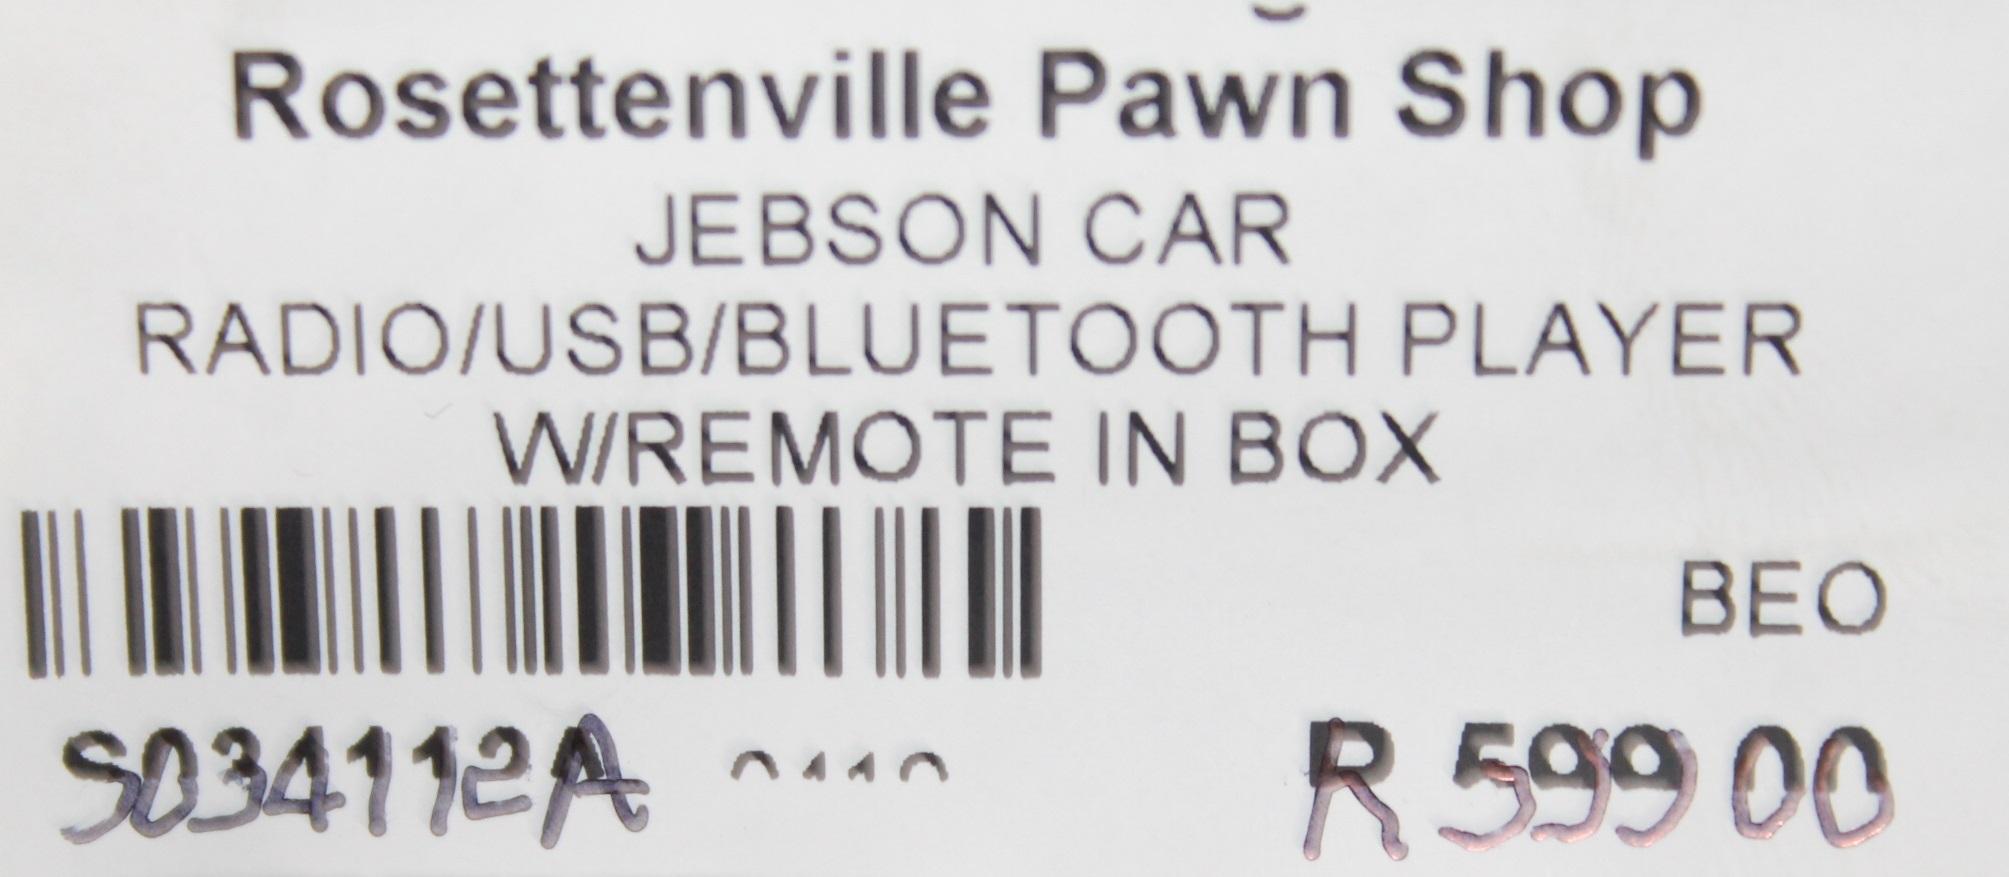 S034112A Jebson car radio #Rosettenvillepawnshop